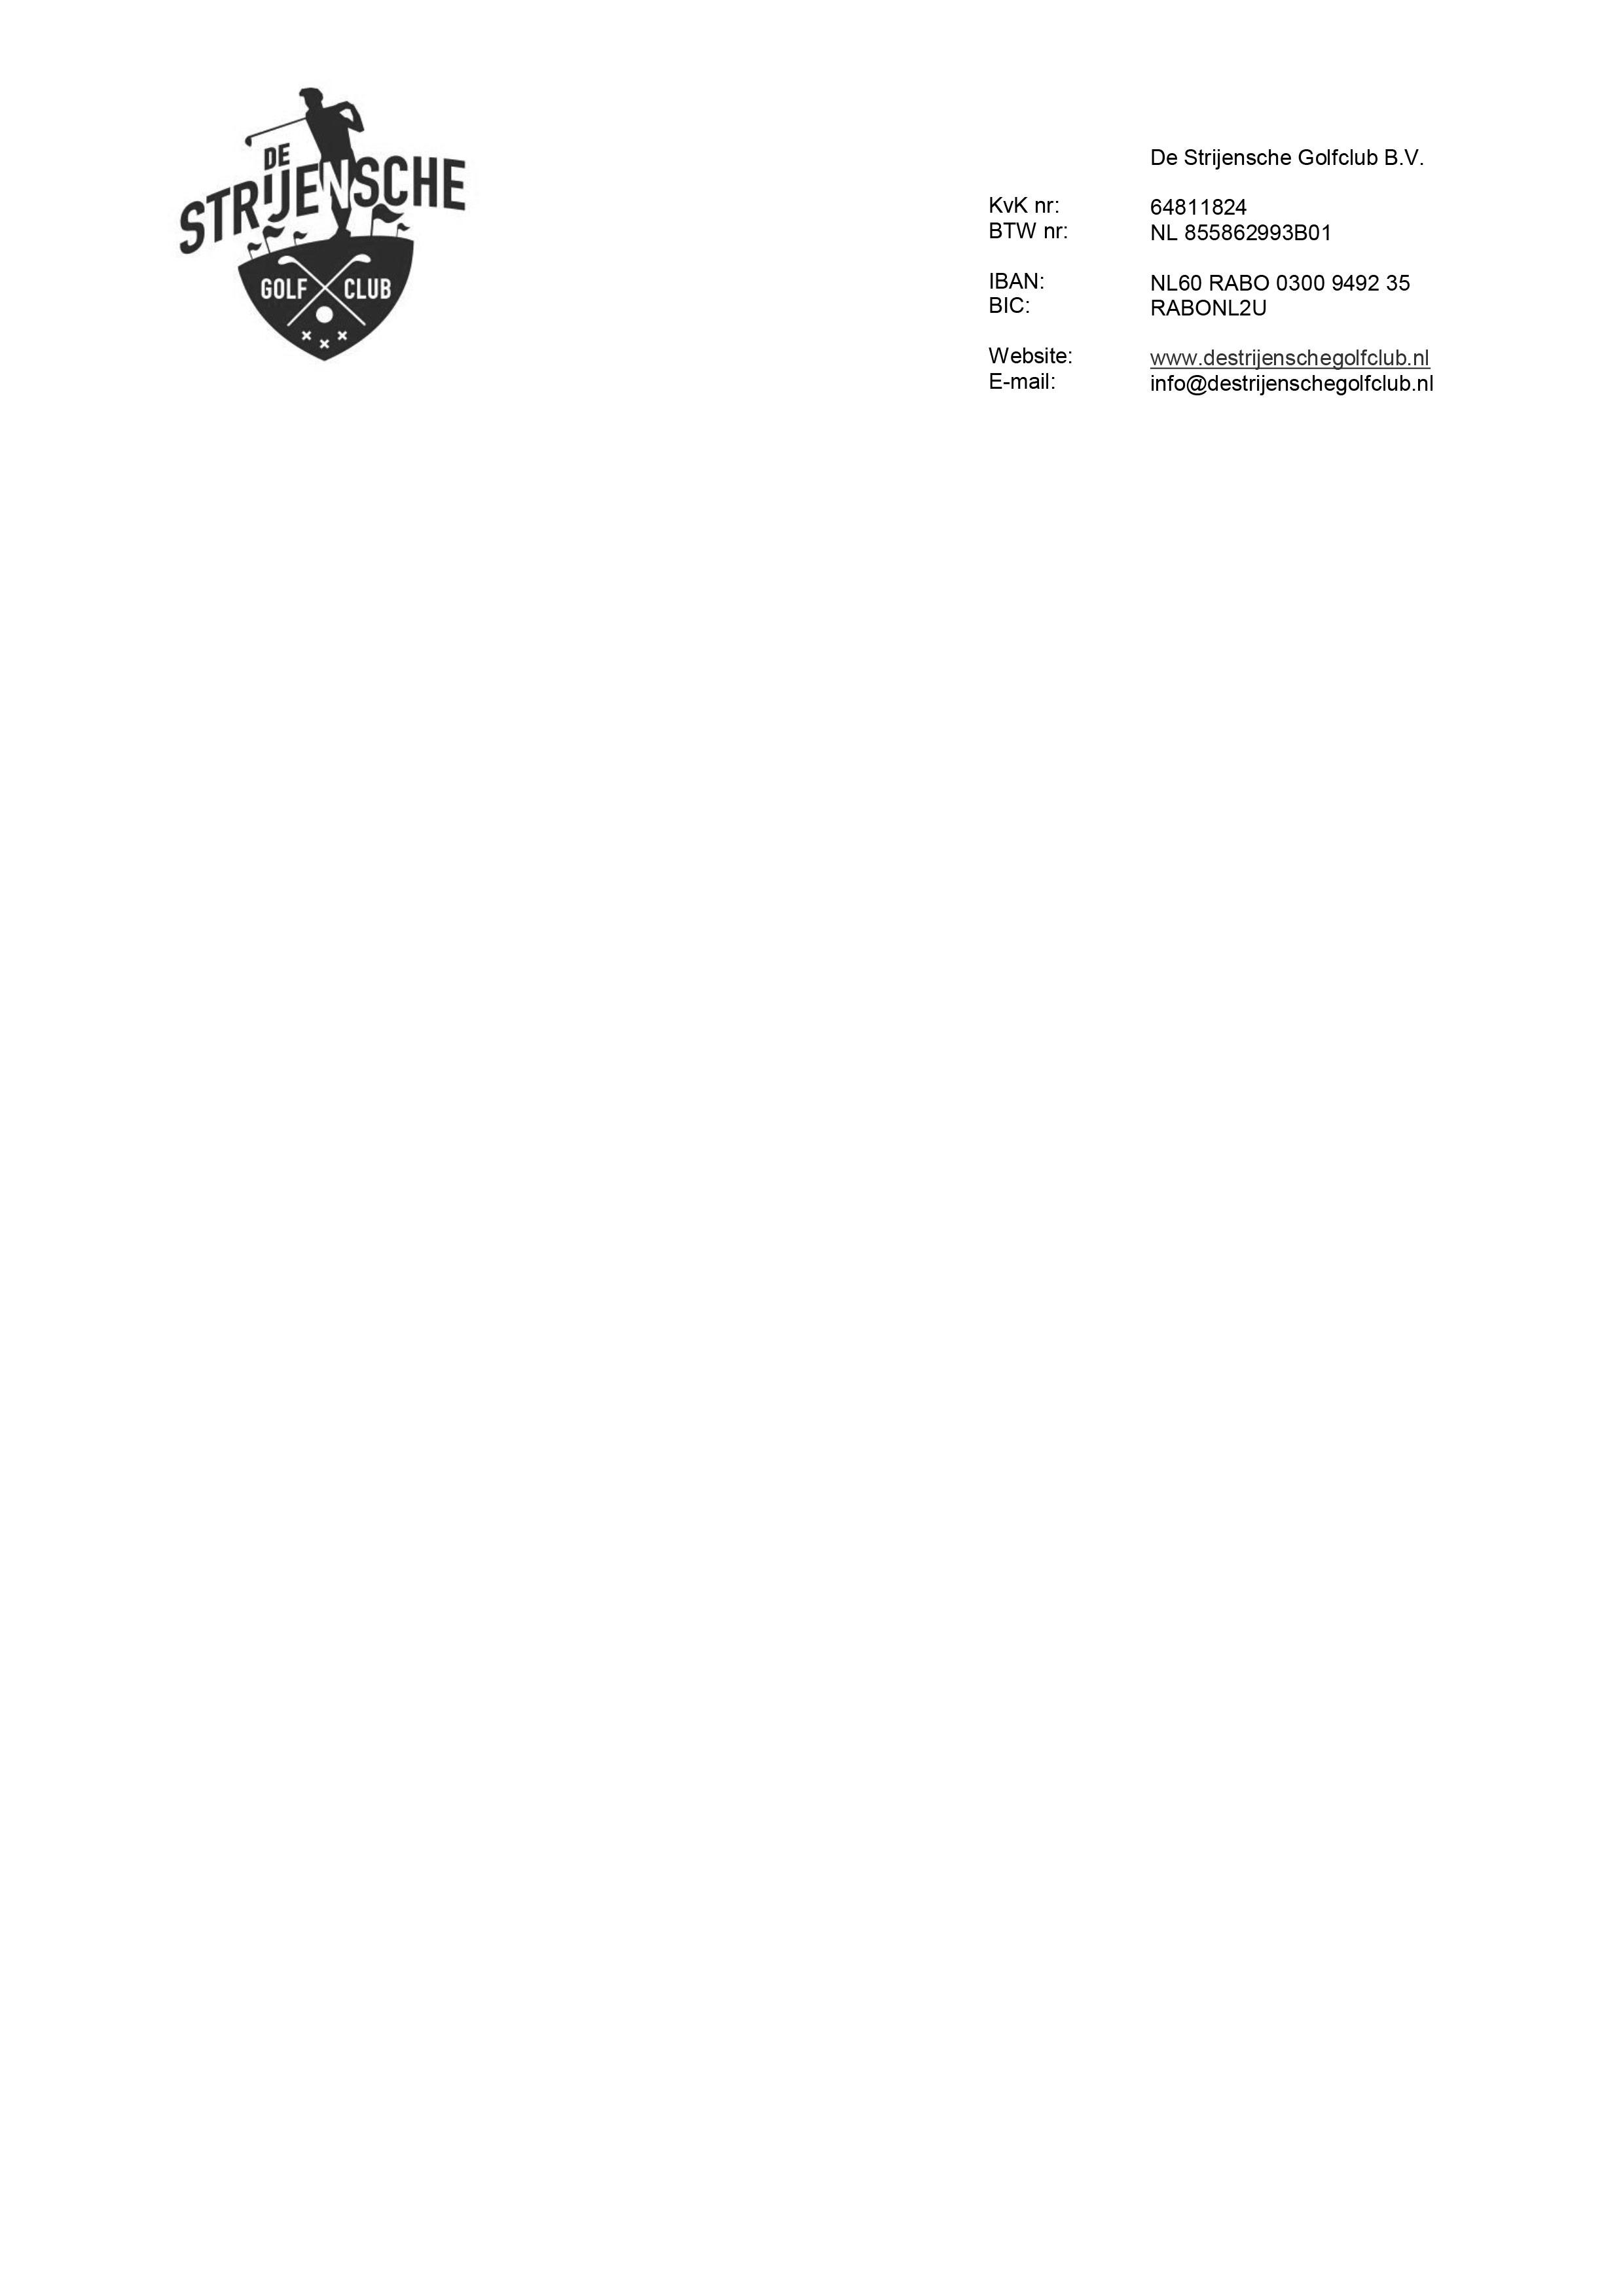 format factuur dsg Format Factuur Blanco | De Strijensche Golfclub